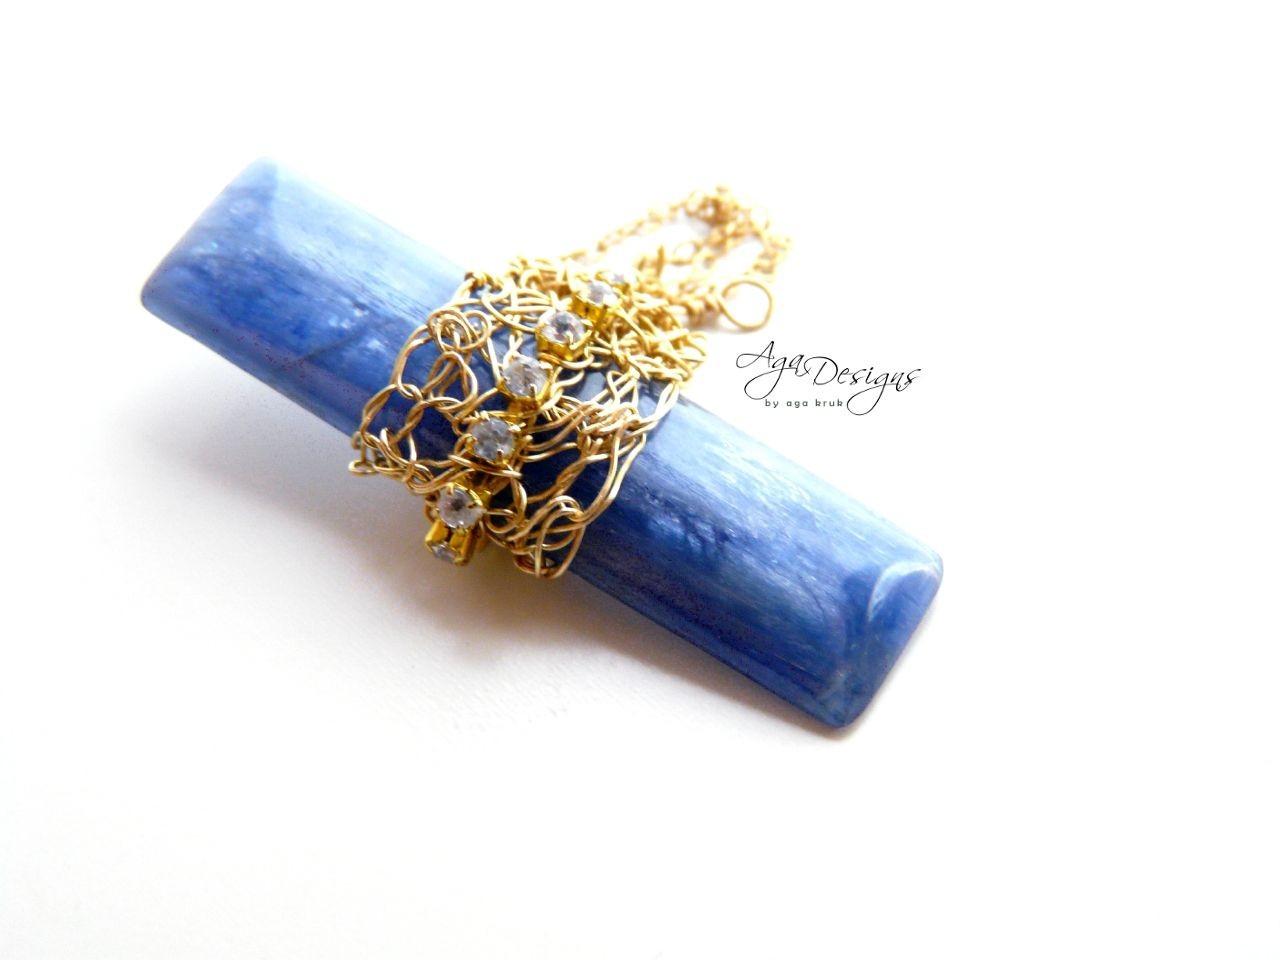 Handmade Jewelry Designs by Aga Kruk agajewelrydesignscom